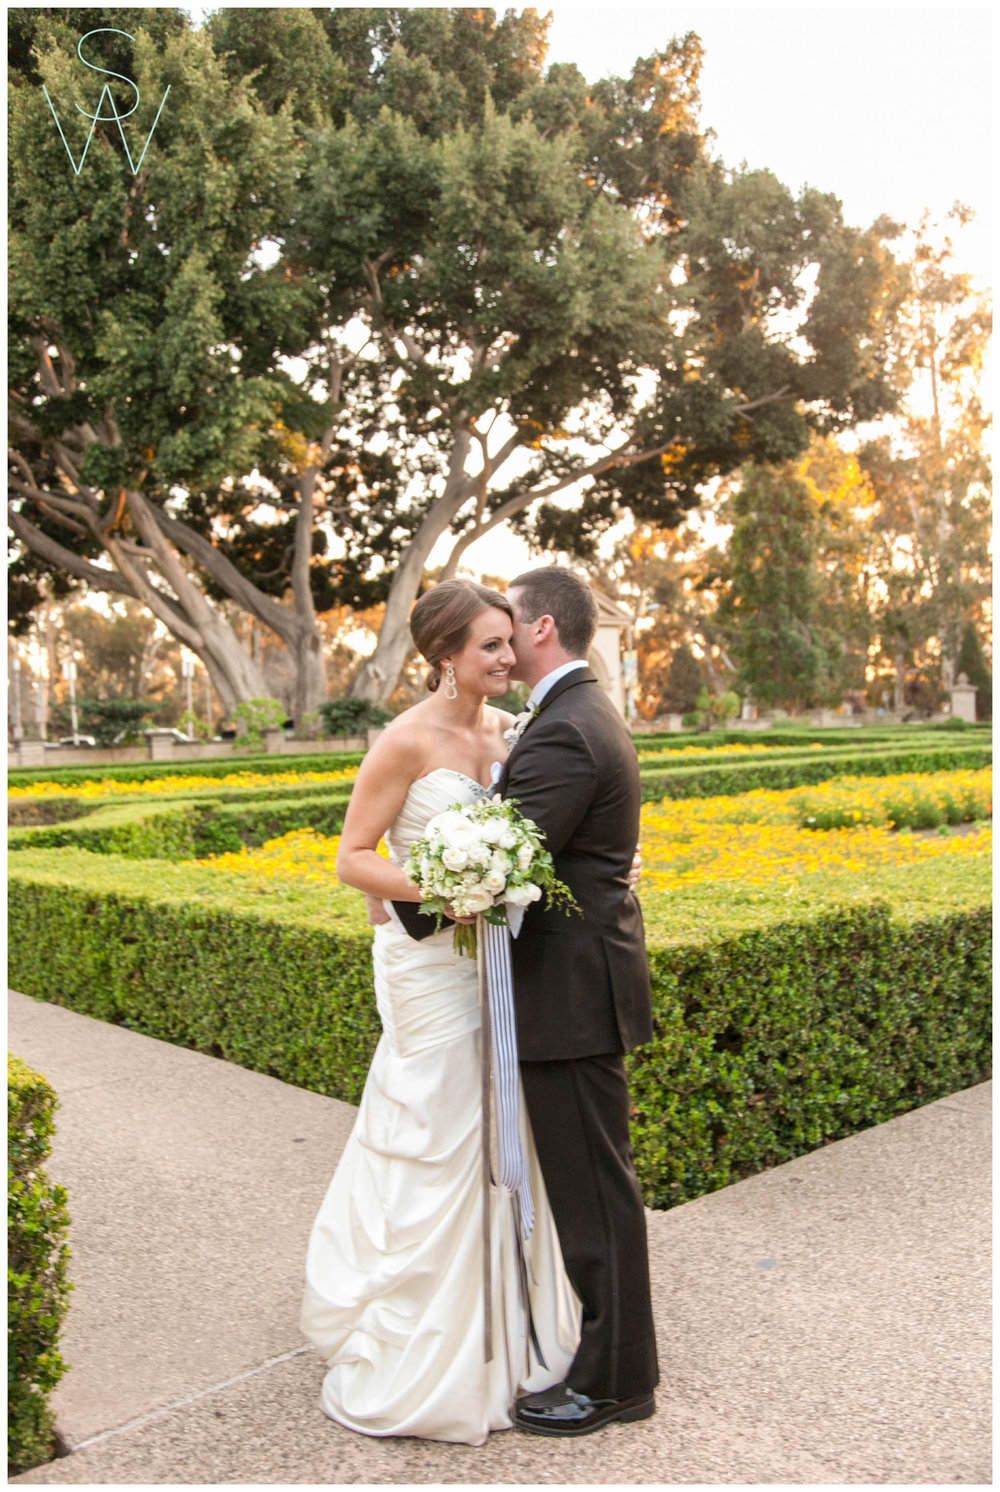 Shewanders.sdma_.wedding.photography-1062.jpg.wedding.photography-1062.jpg